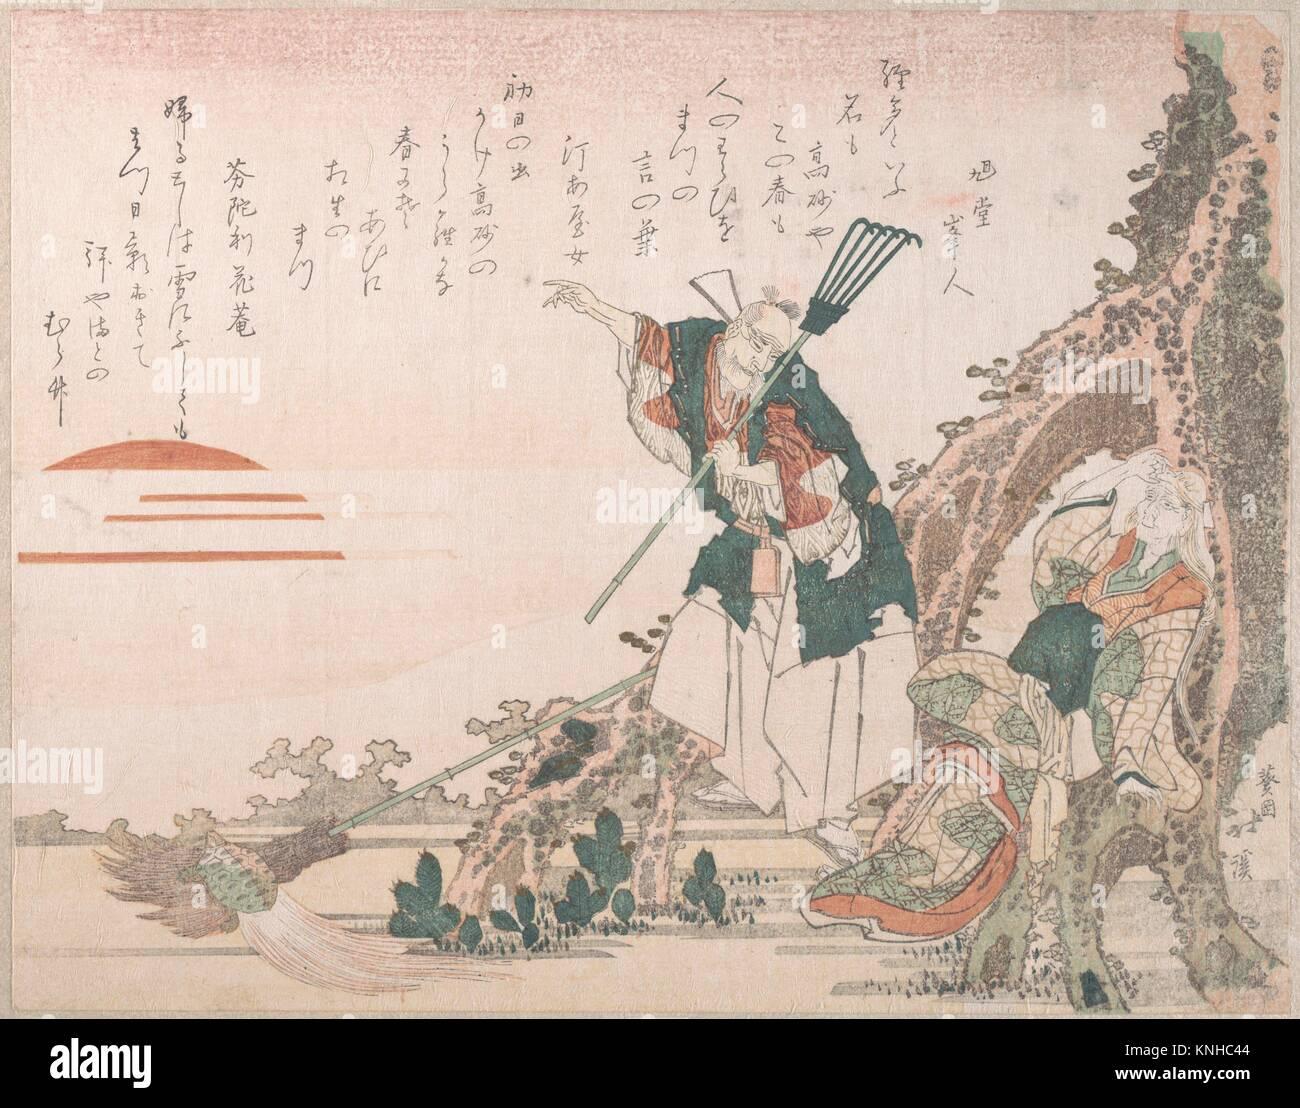 Jo and Uba of Takasago Looking at the Rising Sun; Symbolic Representation of Longevity and Conjugal Harmony. Artist: - Stock Image